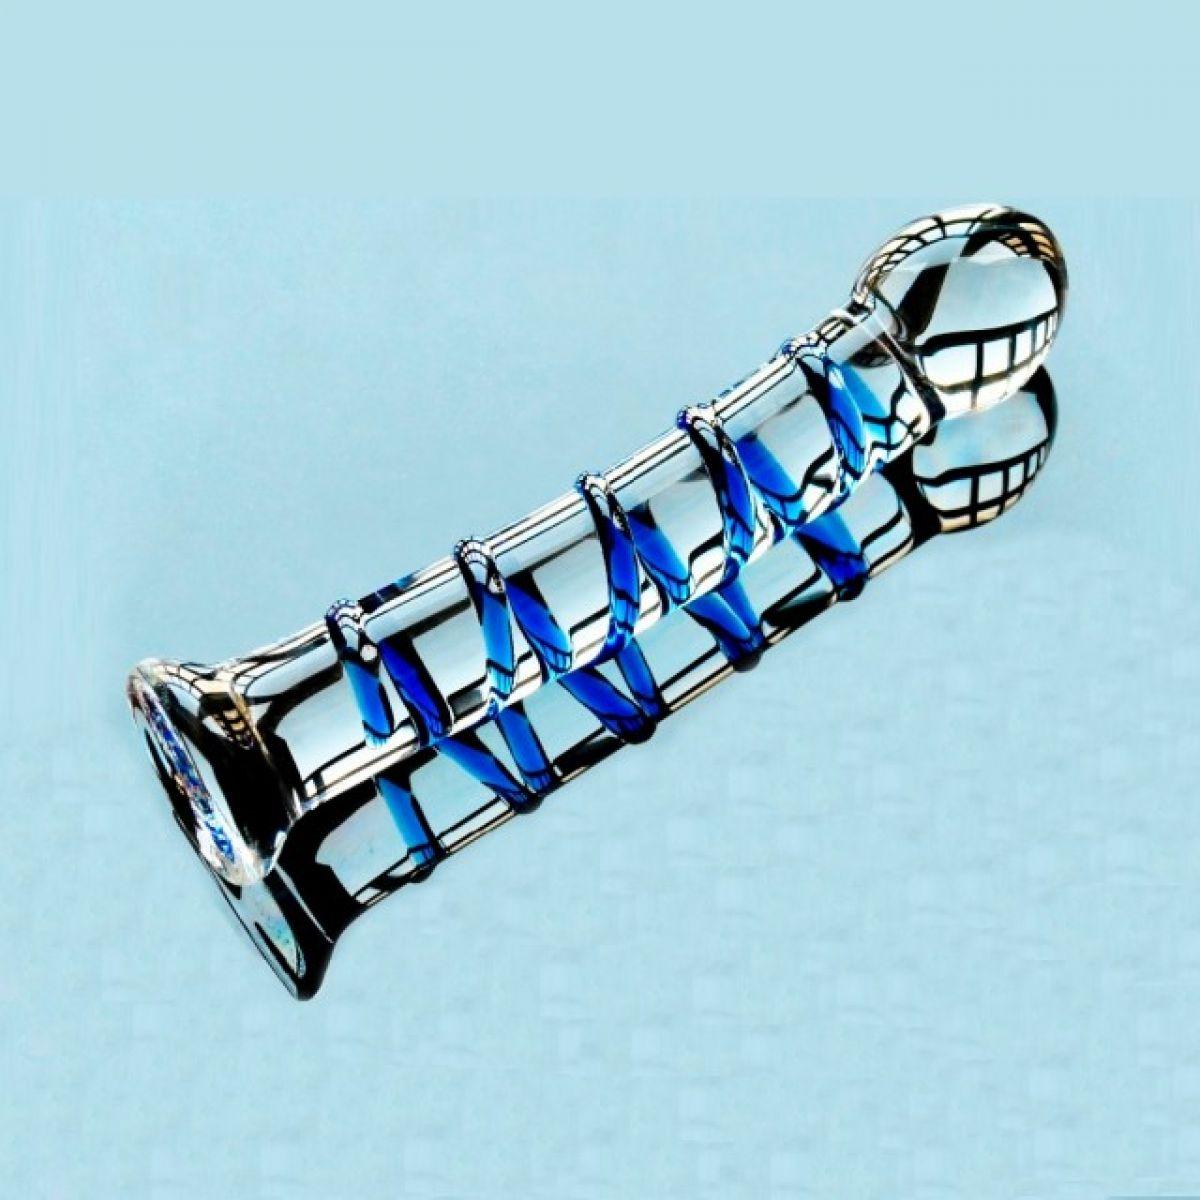 Фаллоимитатор из стекла Blue Spiral